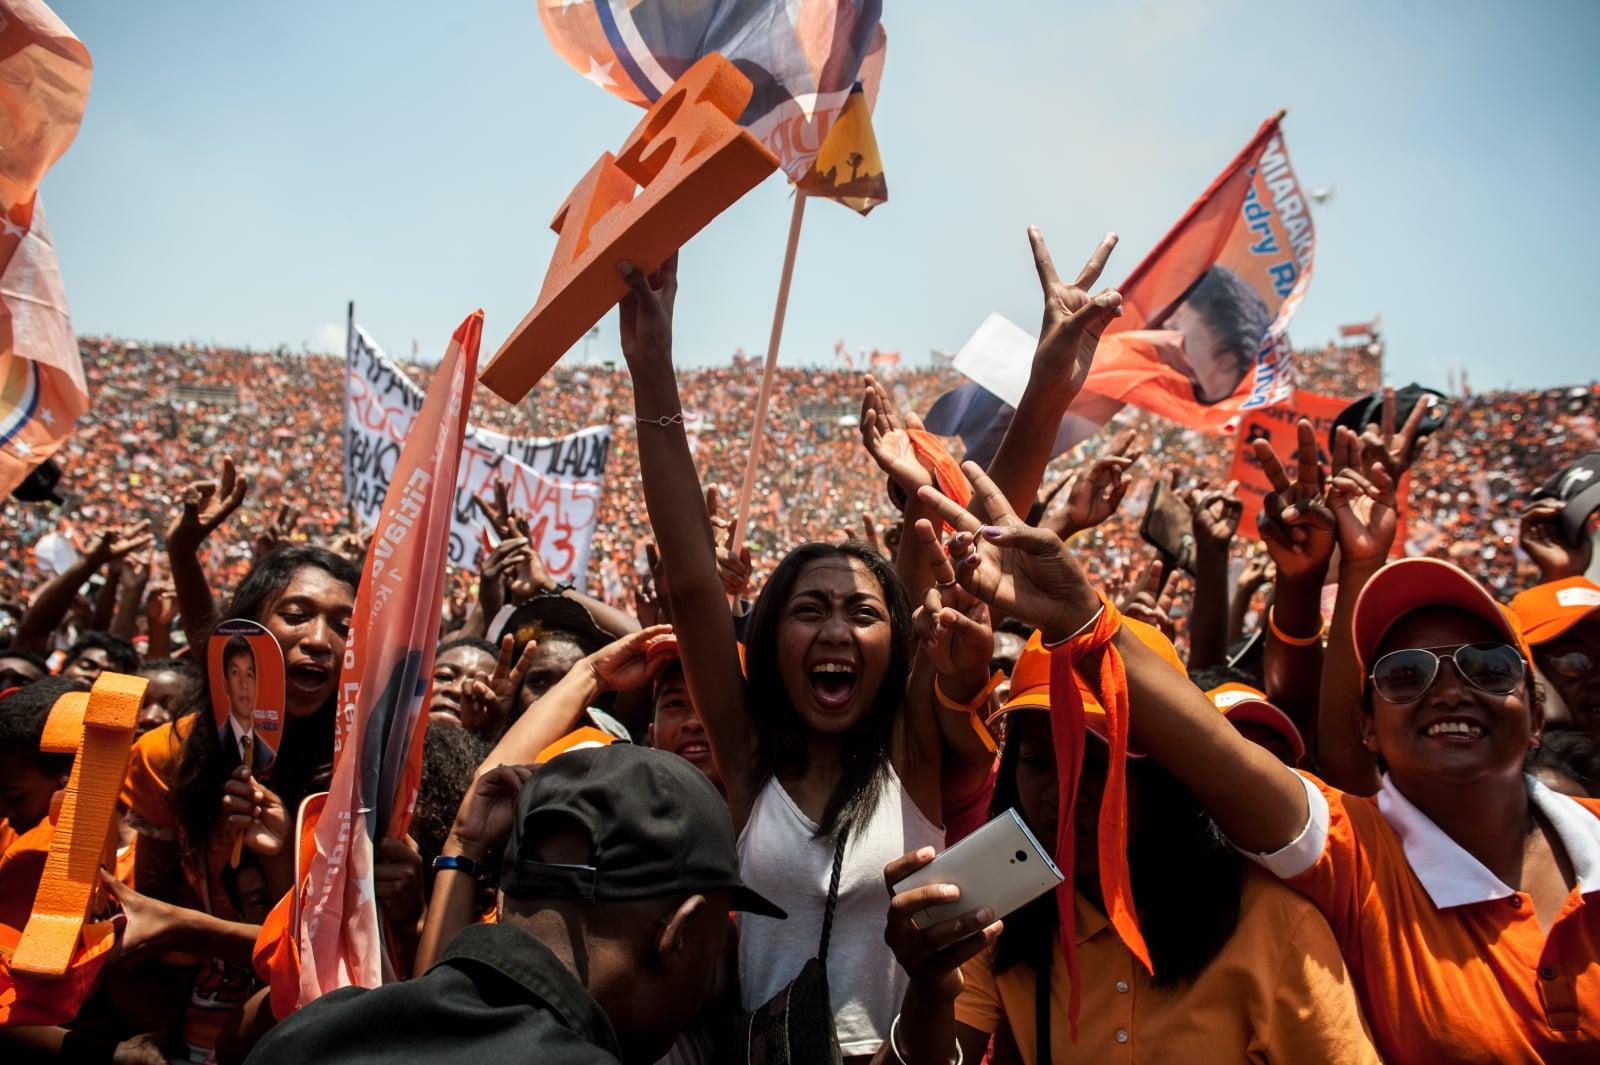 Wybory na Madagaskarze. Fot. PAP/EPA/HENITSOA RAFALIA